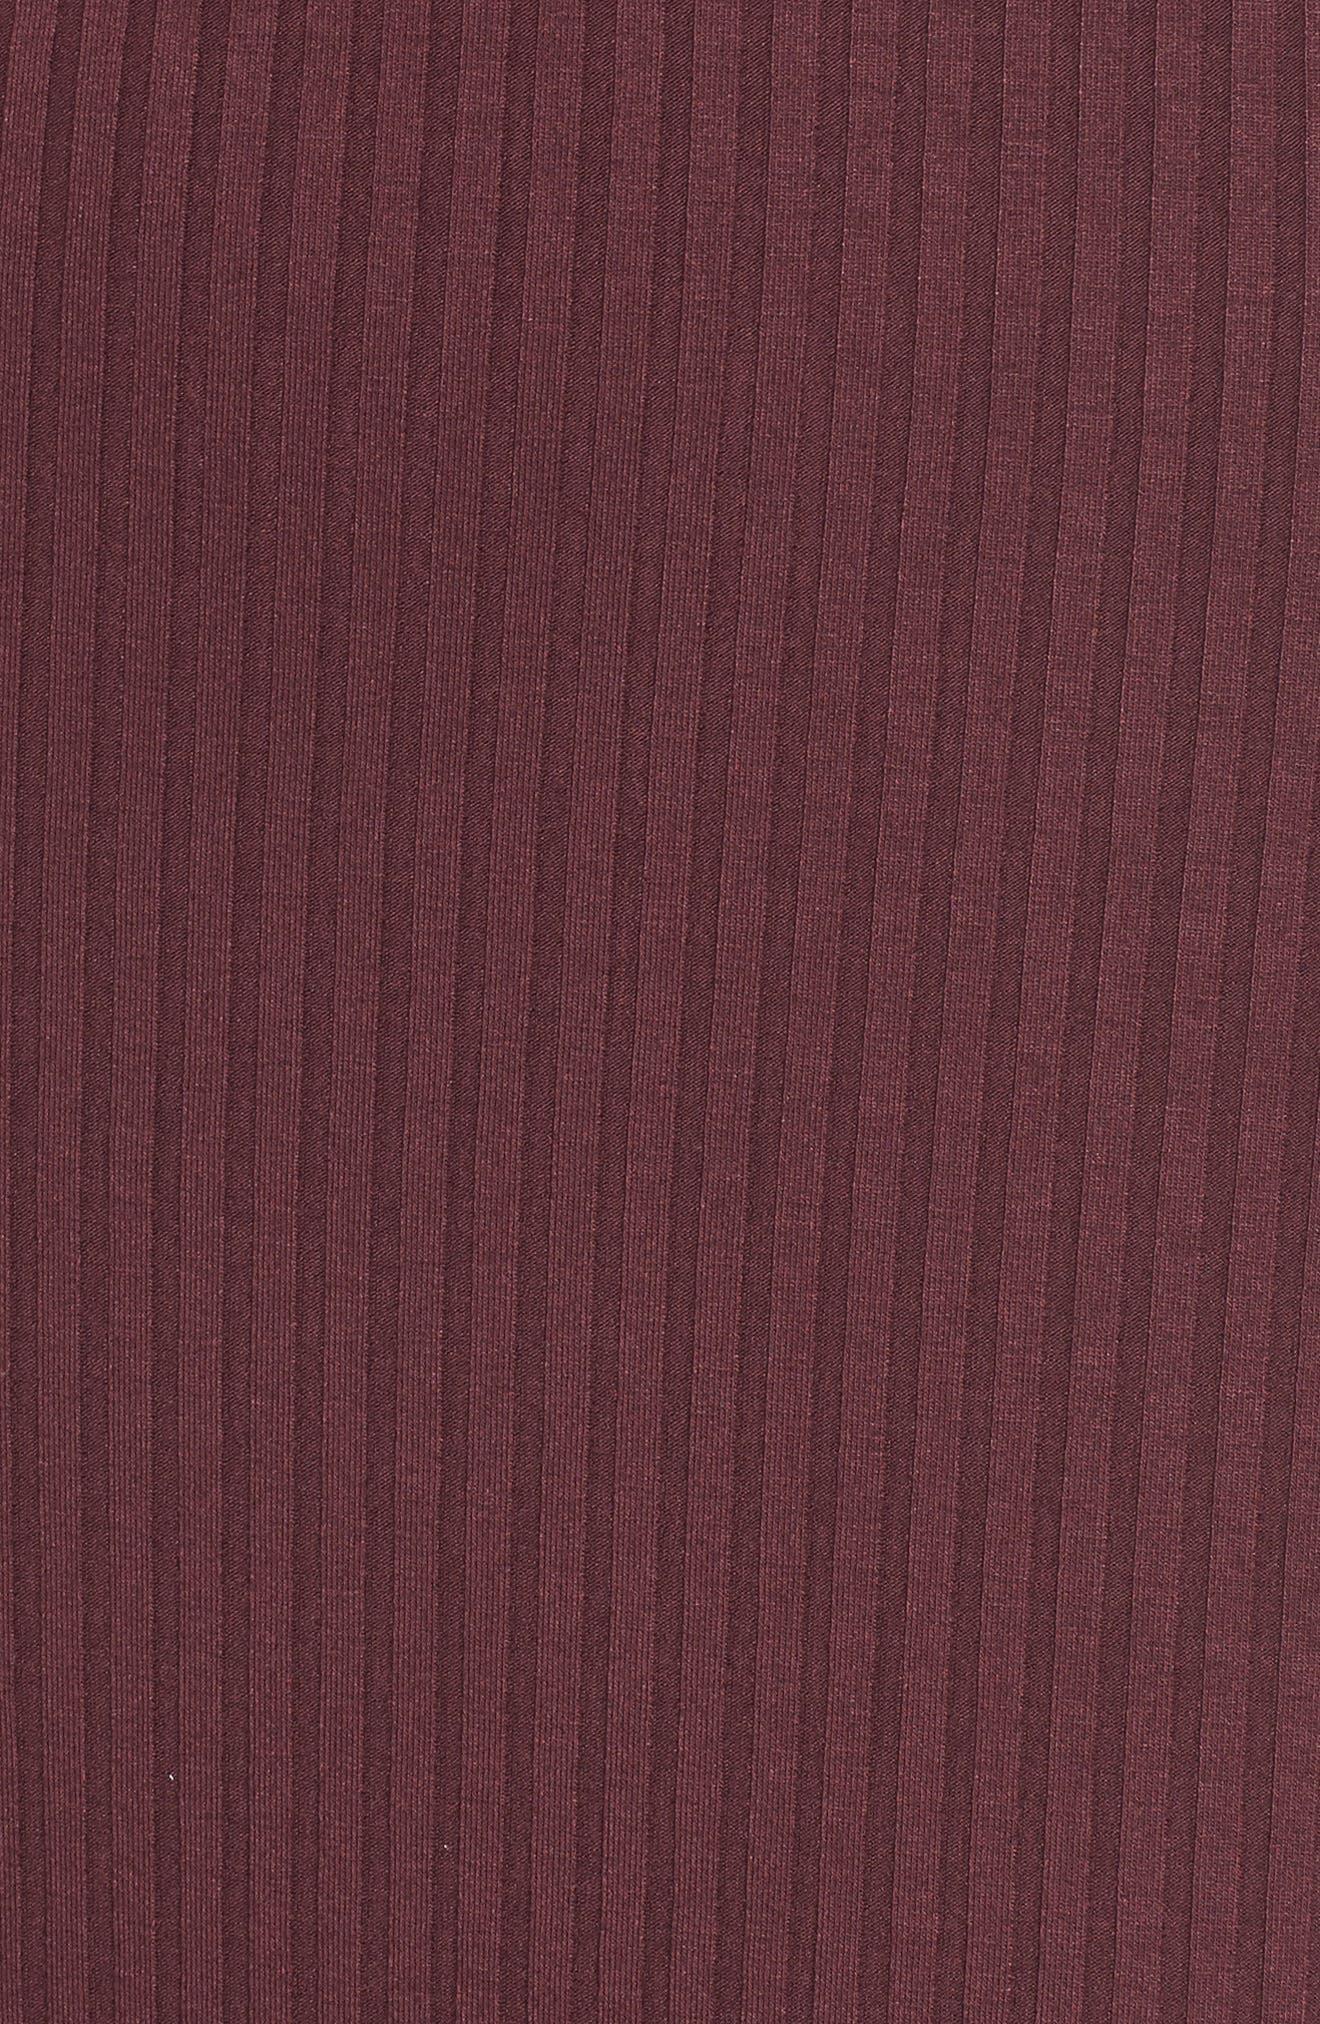 Ribbed Choker Dress,                             Alternate thumbnail 5, color,                             Red Tannin